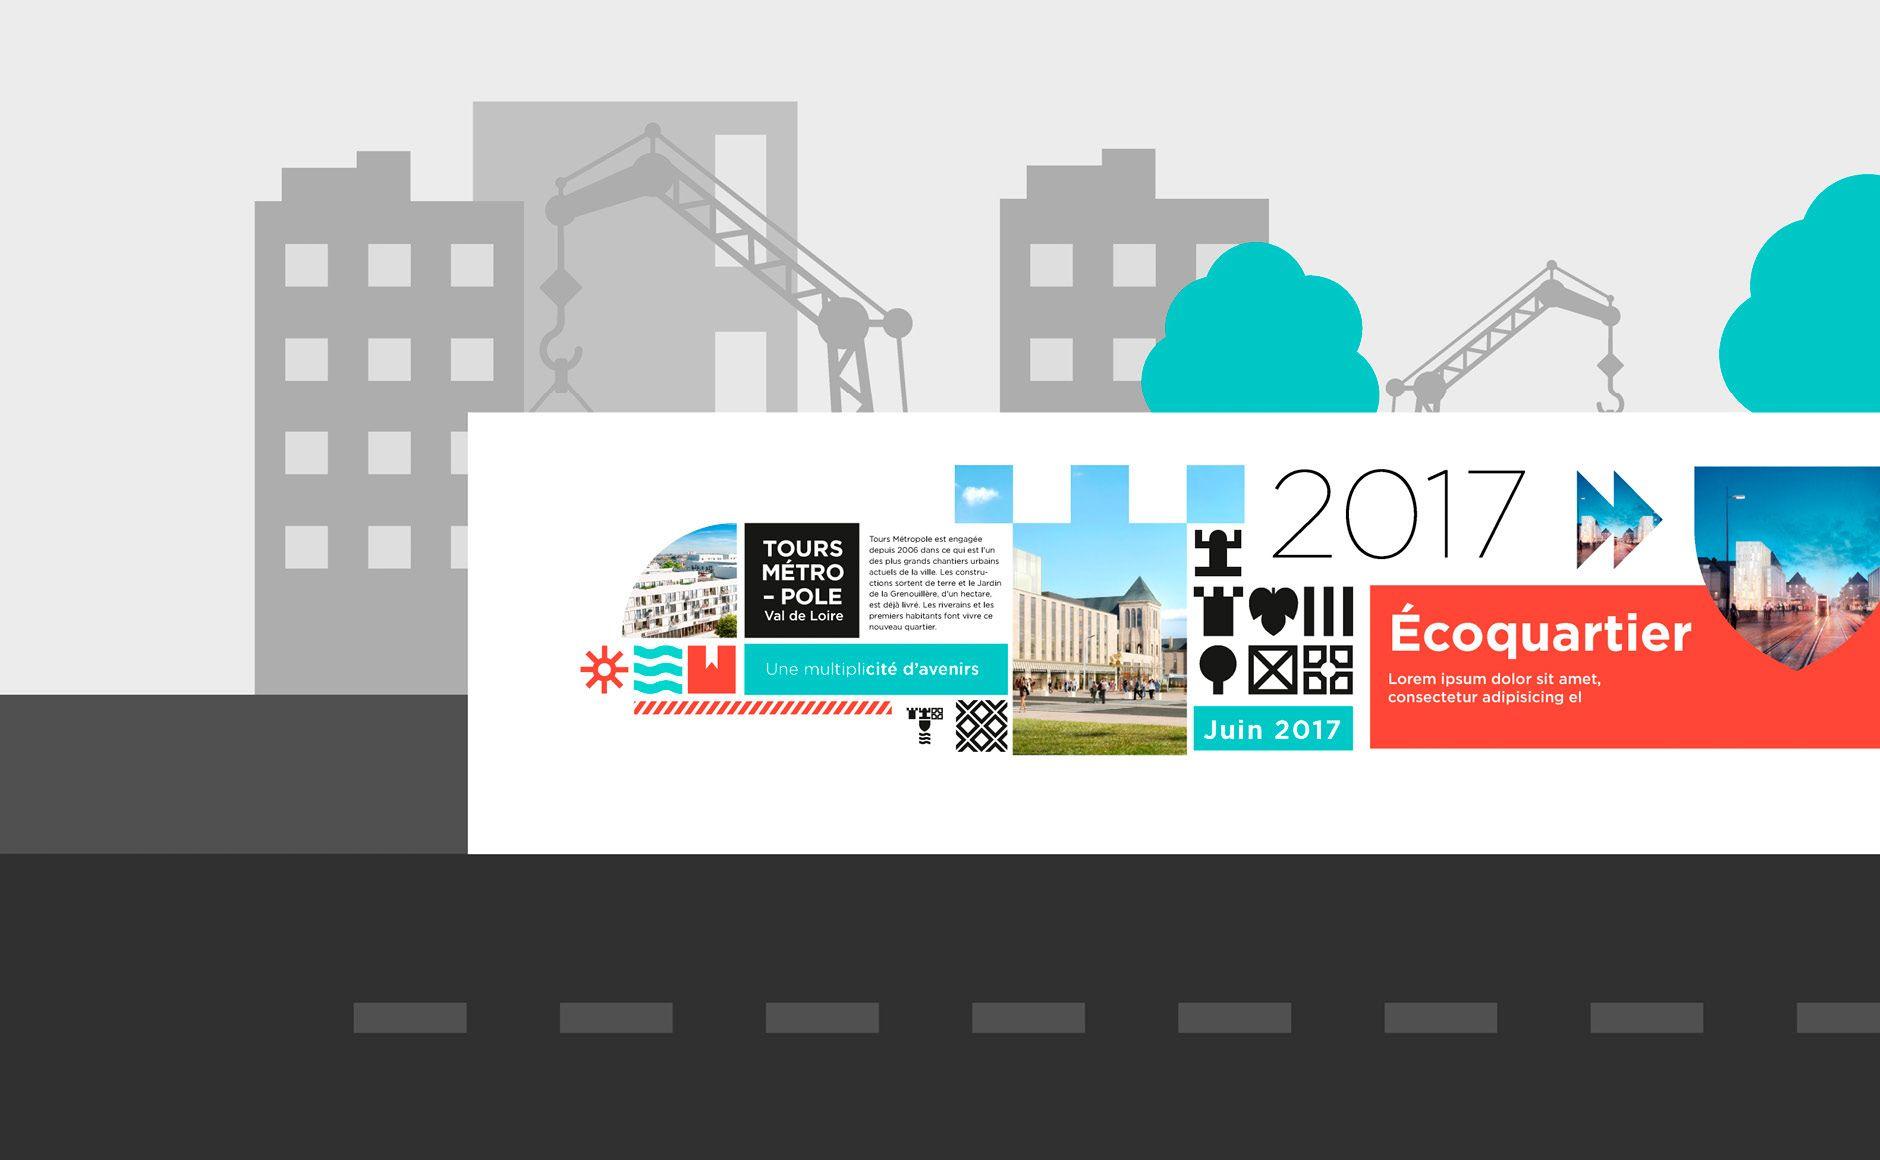 Tours Metropole Brand Design On Behance Branding Design Typography Layout Visual Identity